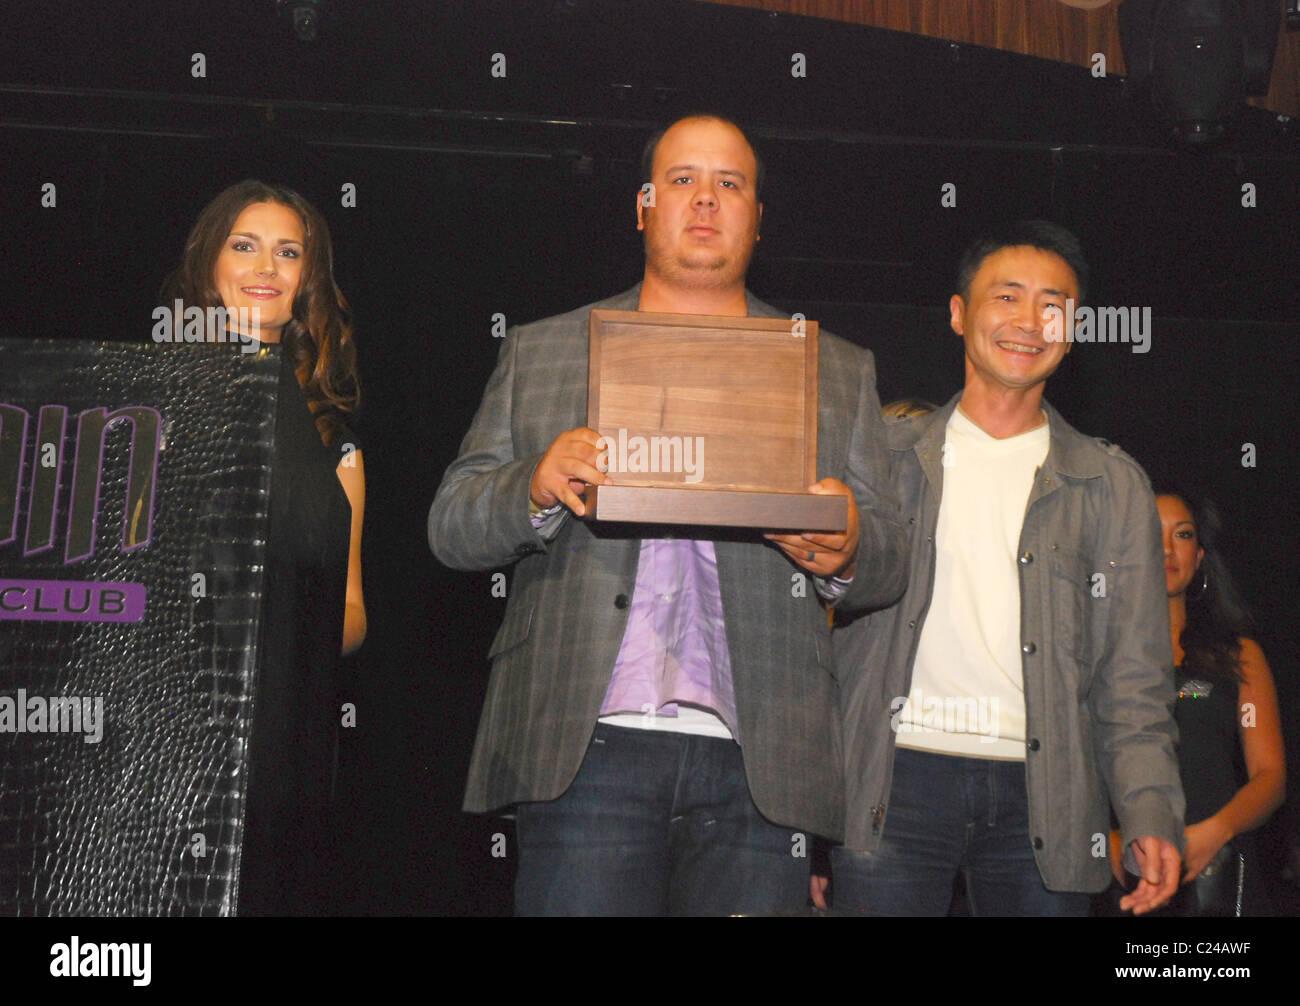 Et Kazunori Yamauchi réduite la SEMA 2009 Gran Turismo Awards de Las Vegas, Nevada - 04.11.09 Banque D'Images